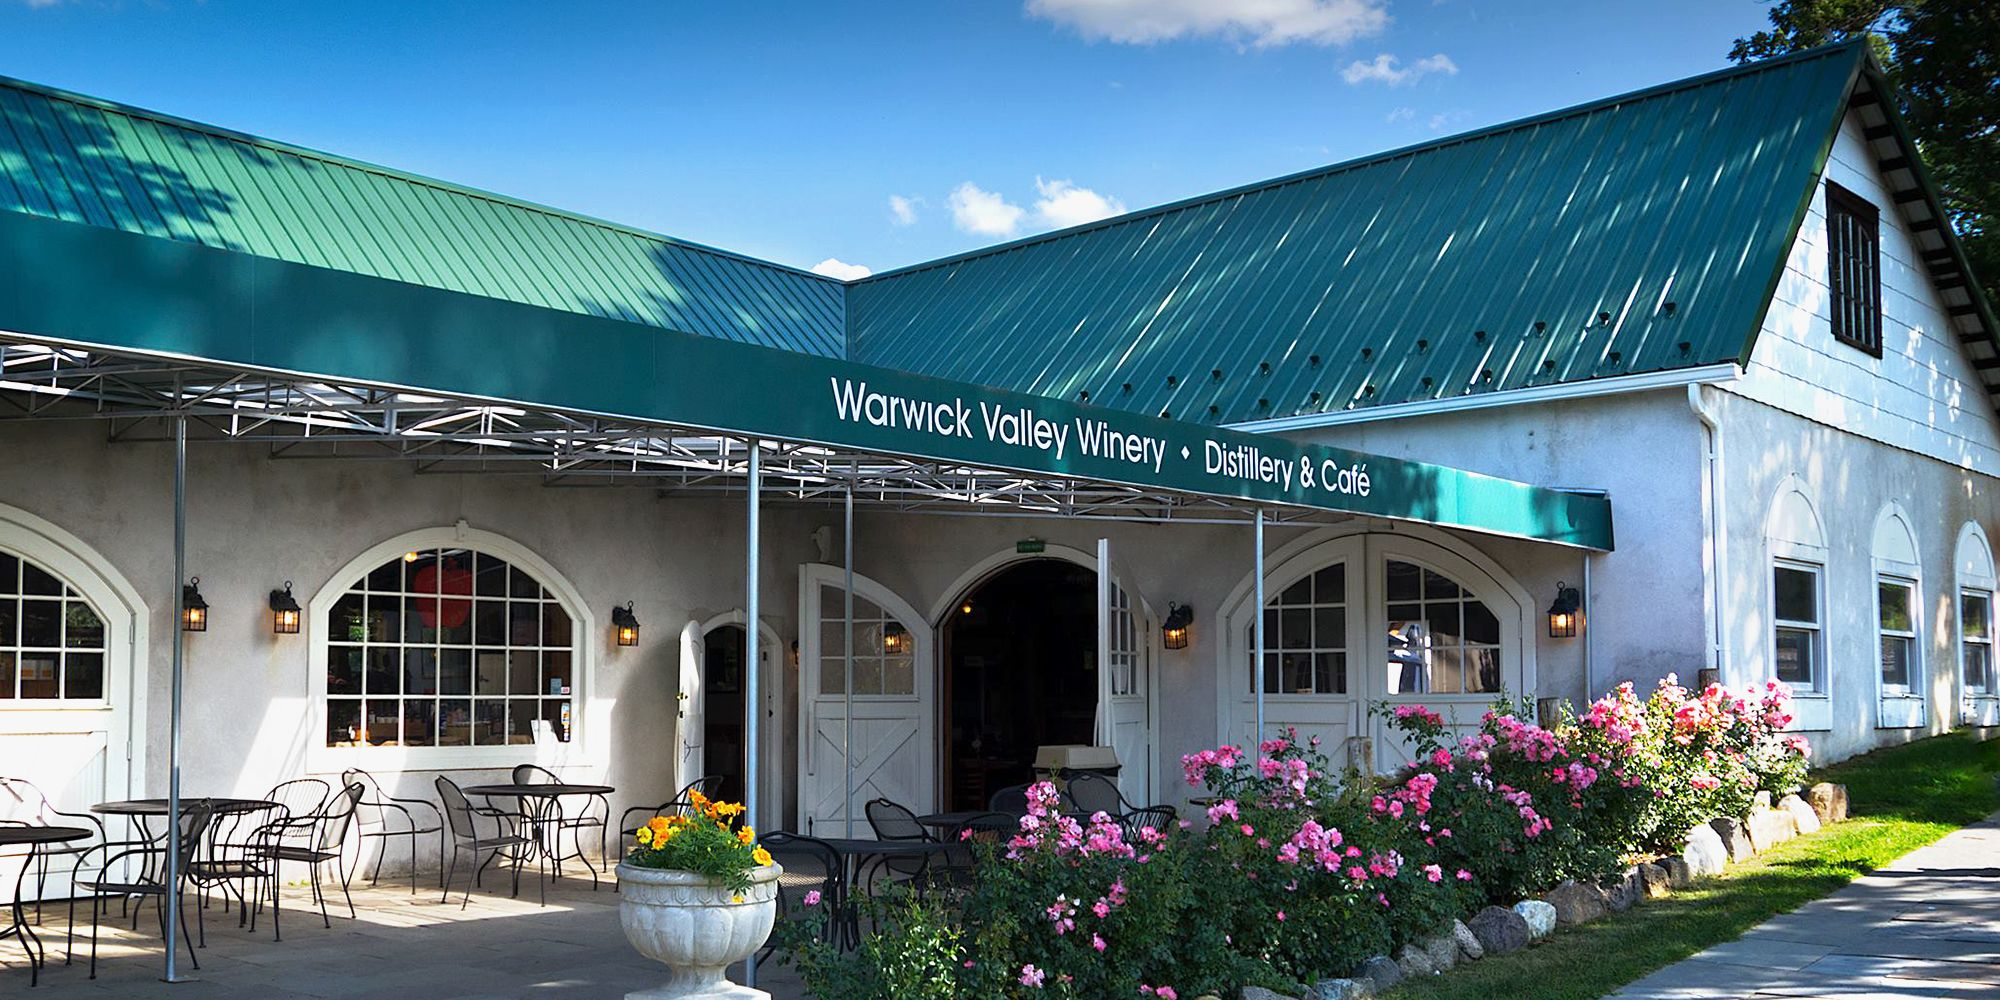 warwick valley winery distillery